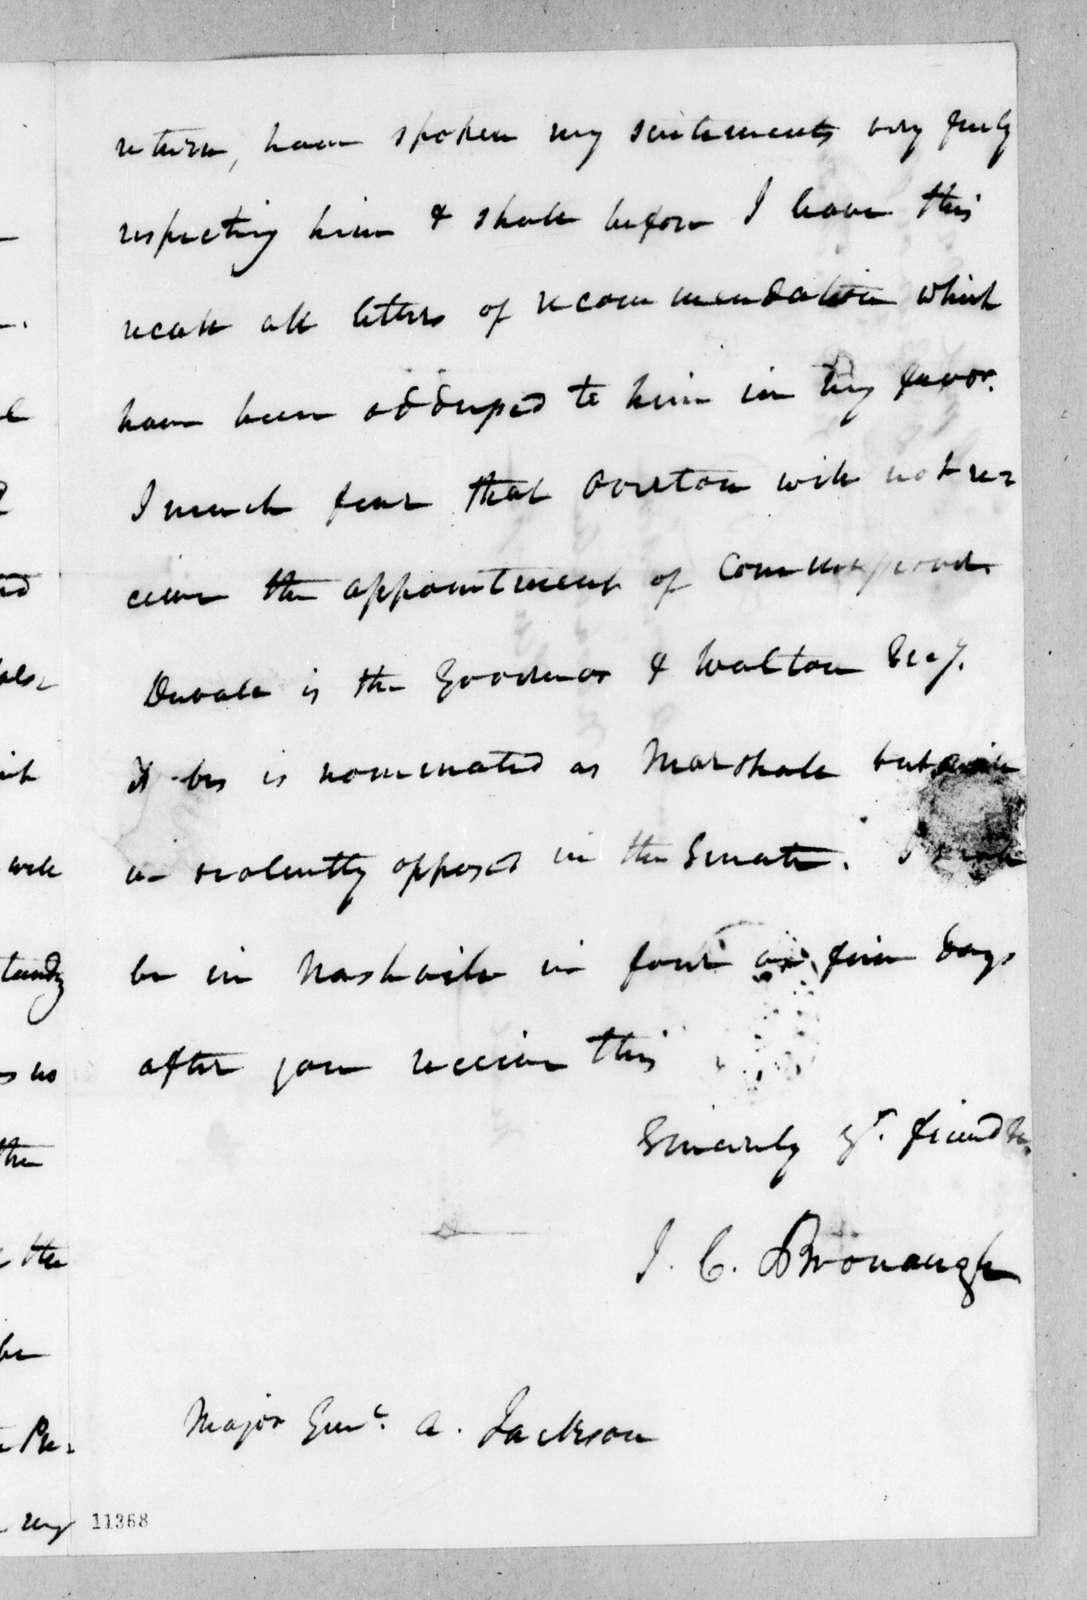 James Craine Bronaugh to Andrew Jackson, April 16, 1822